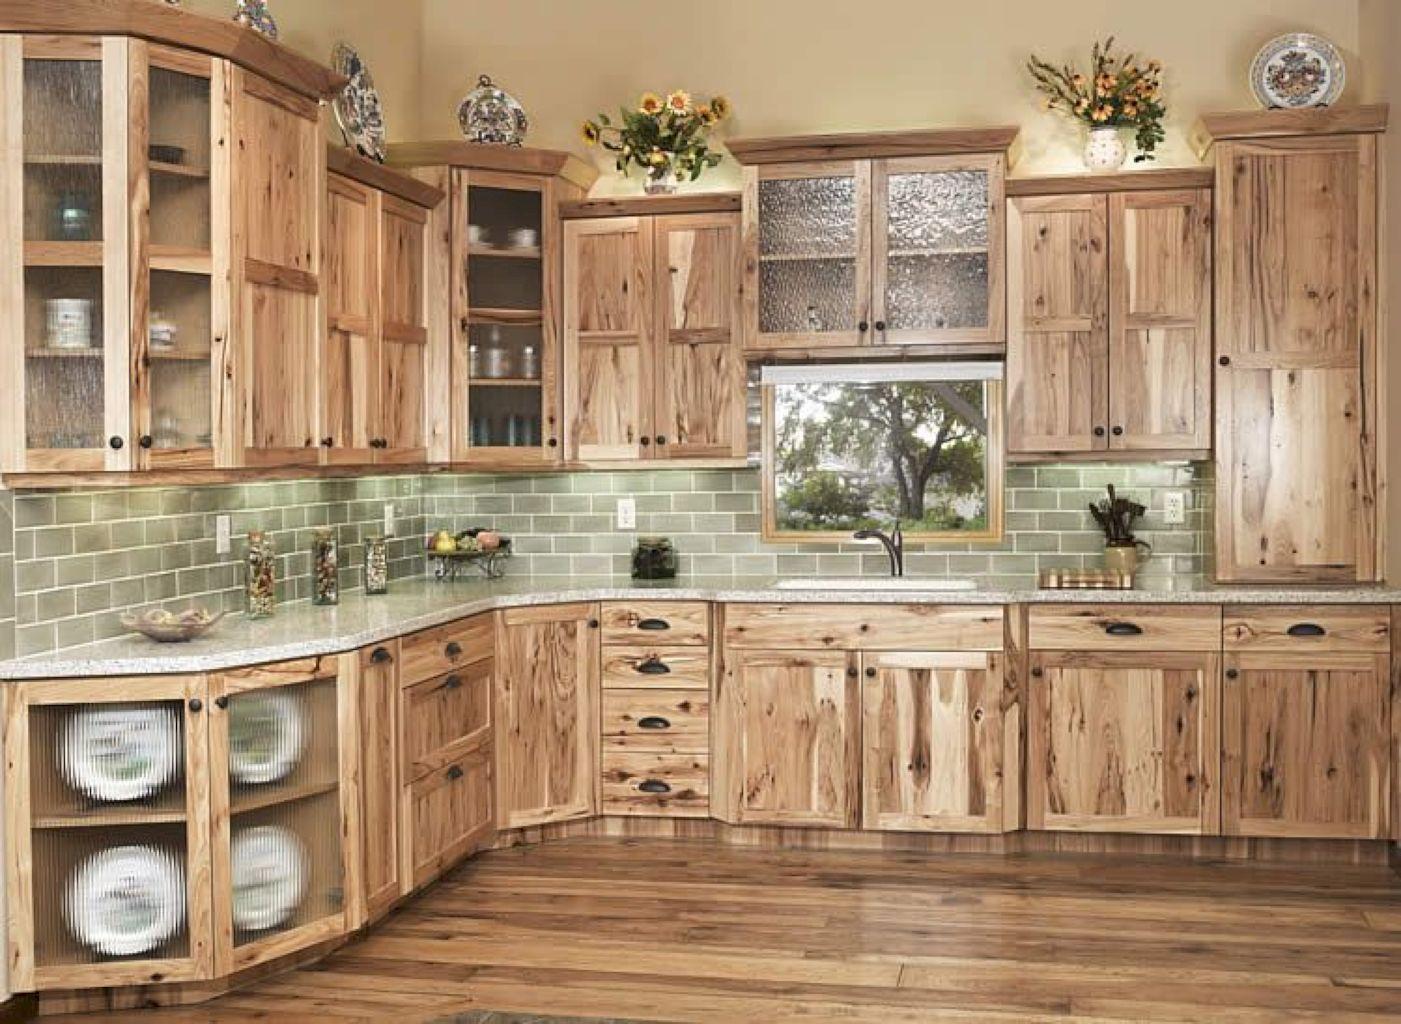 Cool 35 Best Rustic Farmhouse Kitchen Cabinets Ideas Https Homeylife Com 35 Best Country Kitchen Farmhouse Rustic Farmhouse Kitchen Farmhouse Kitchen Design